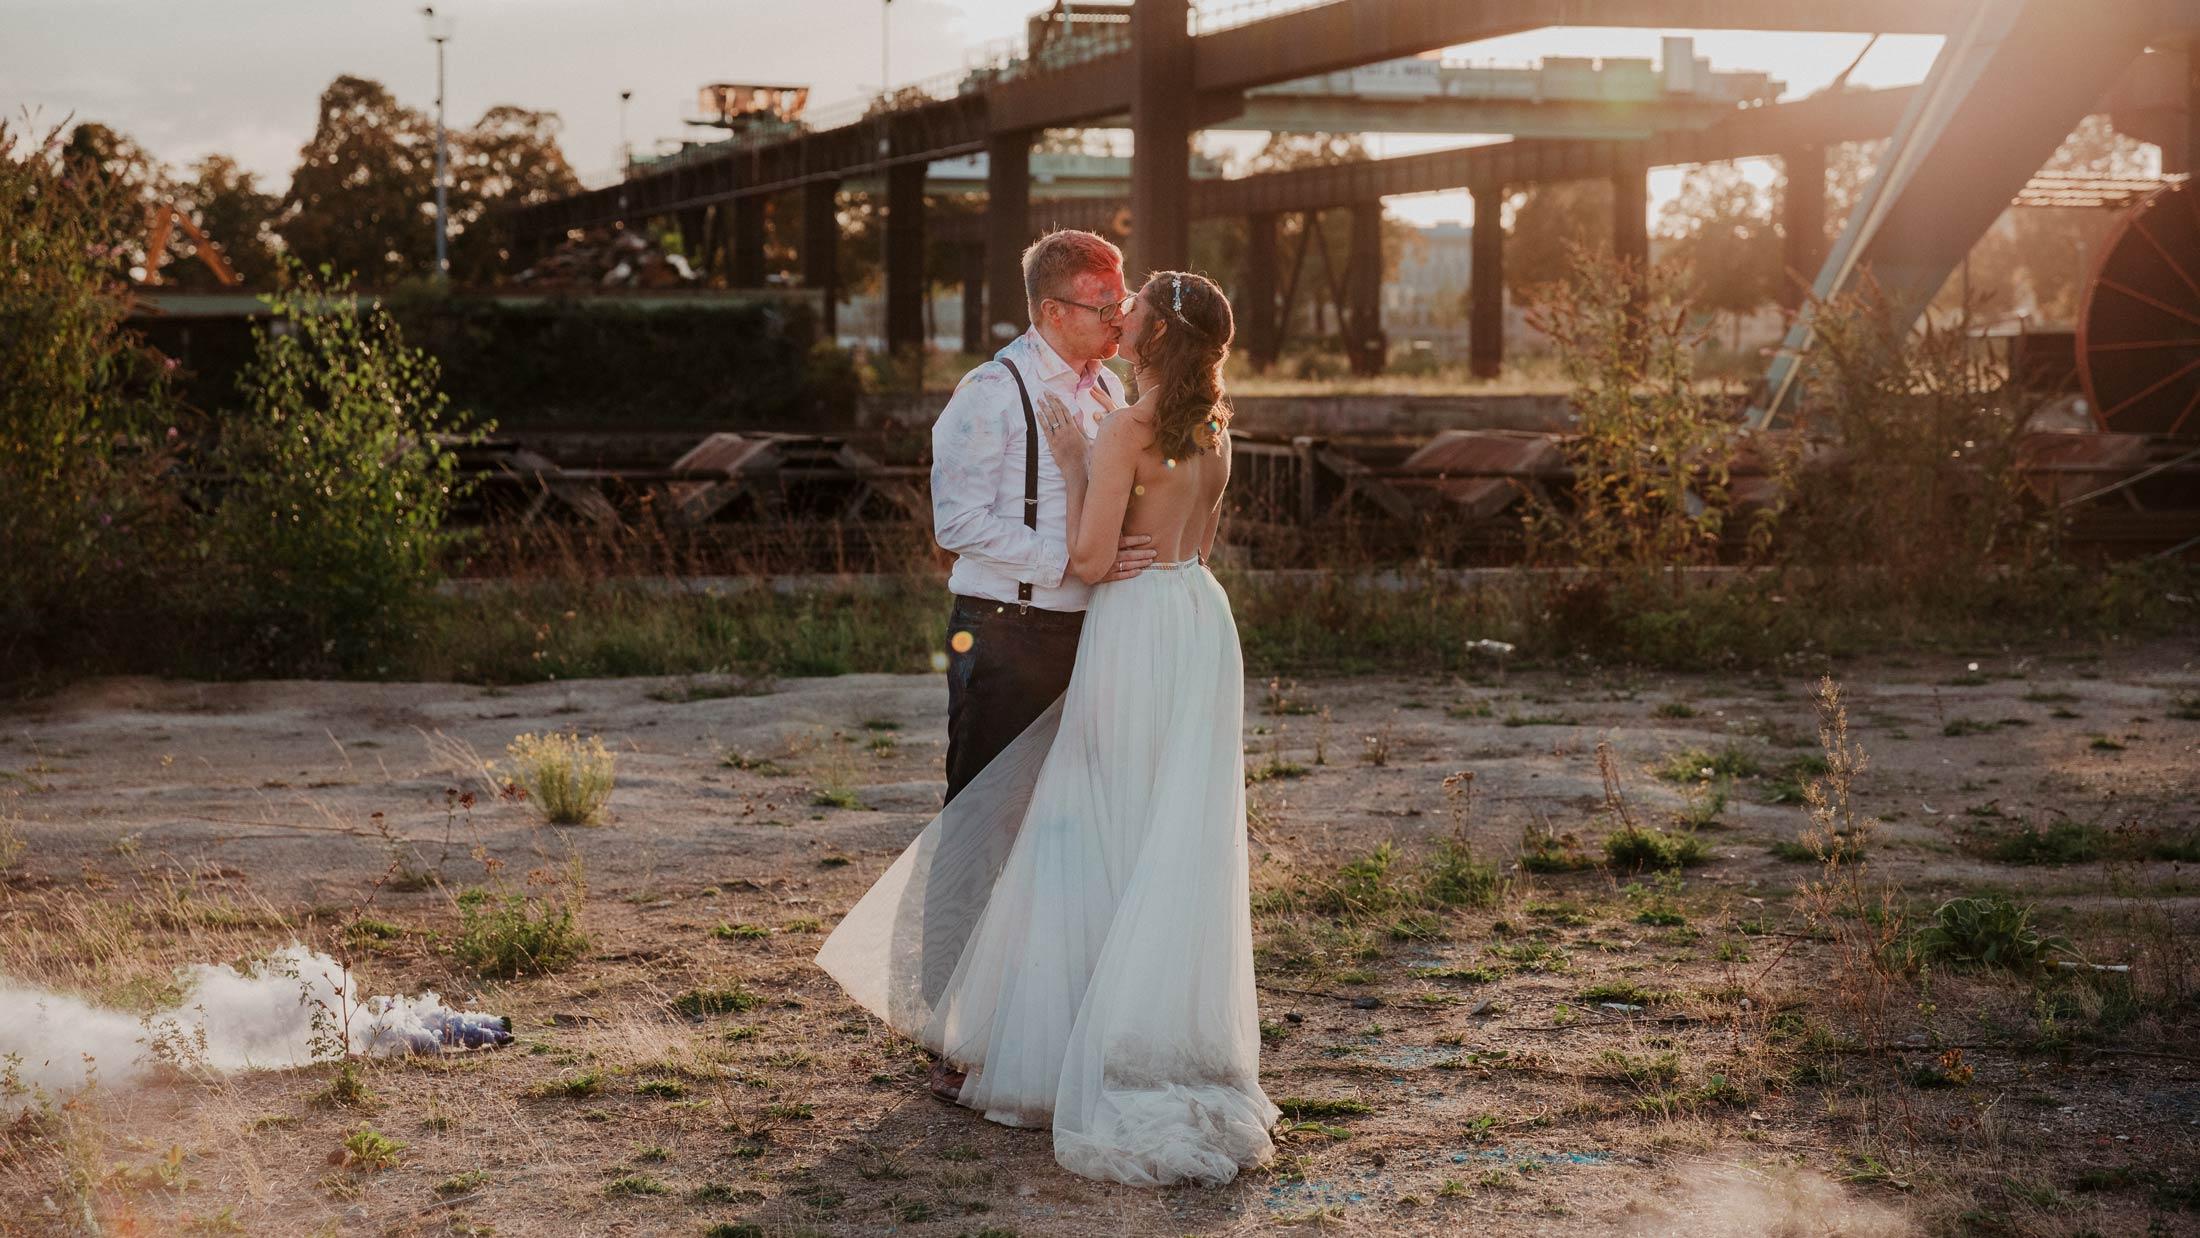 Afterwedding Highlight Video